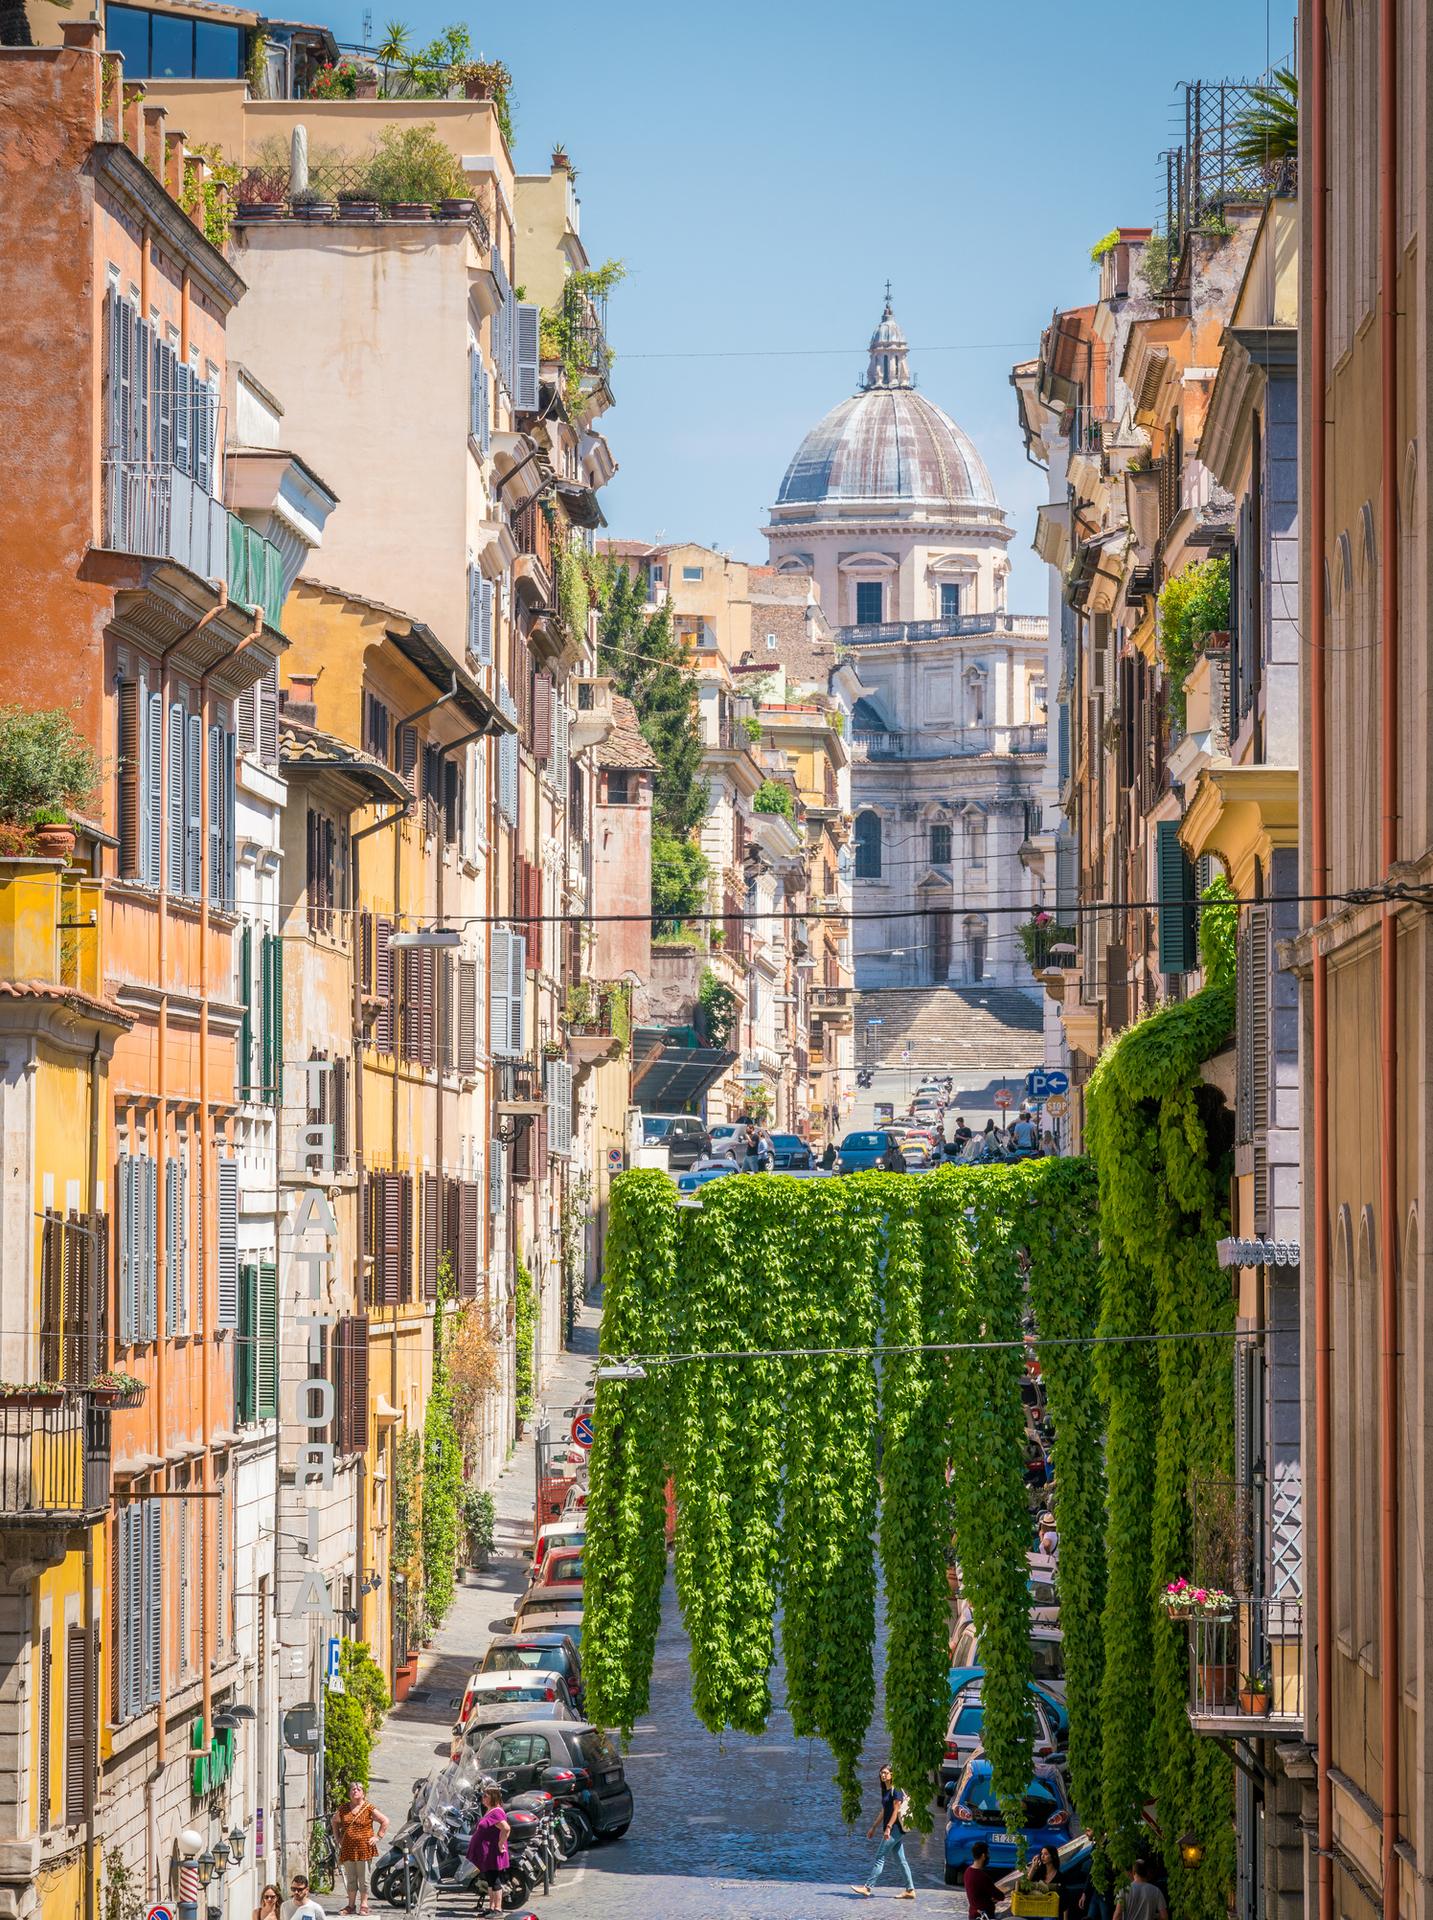 Live Like a Local... in Monti, Rome